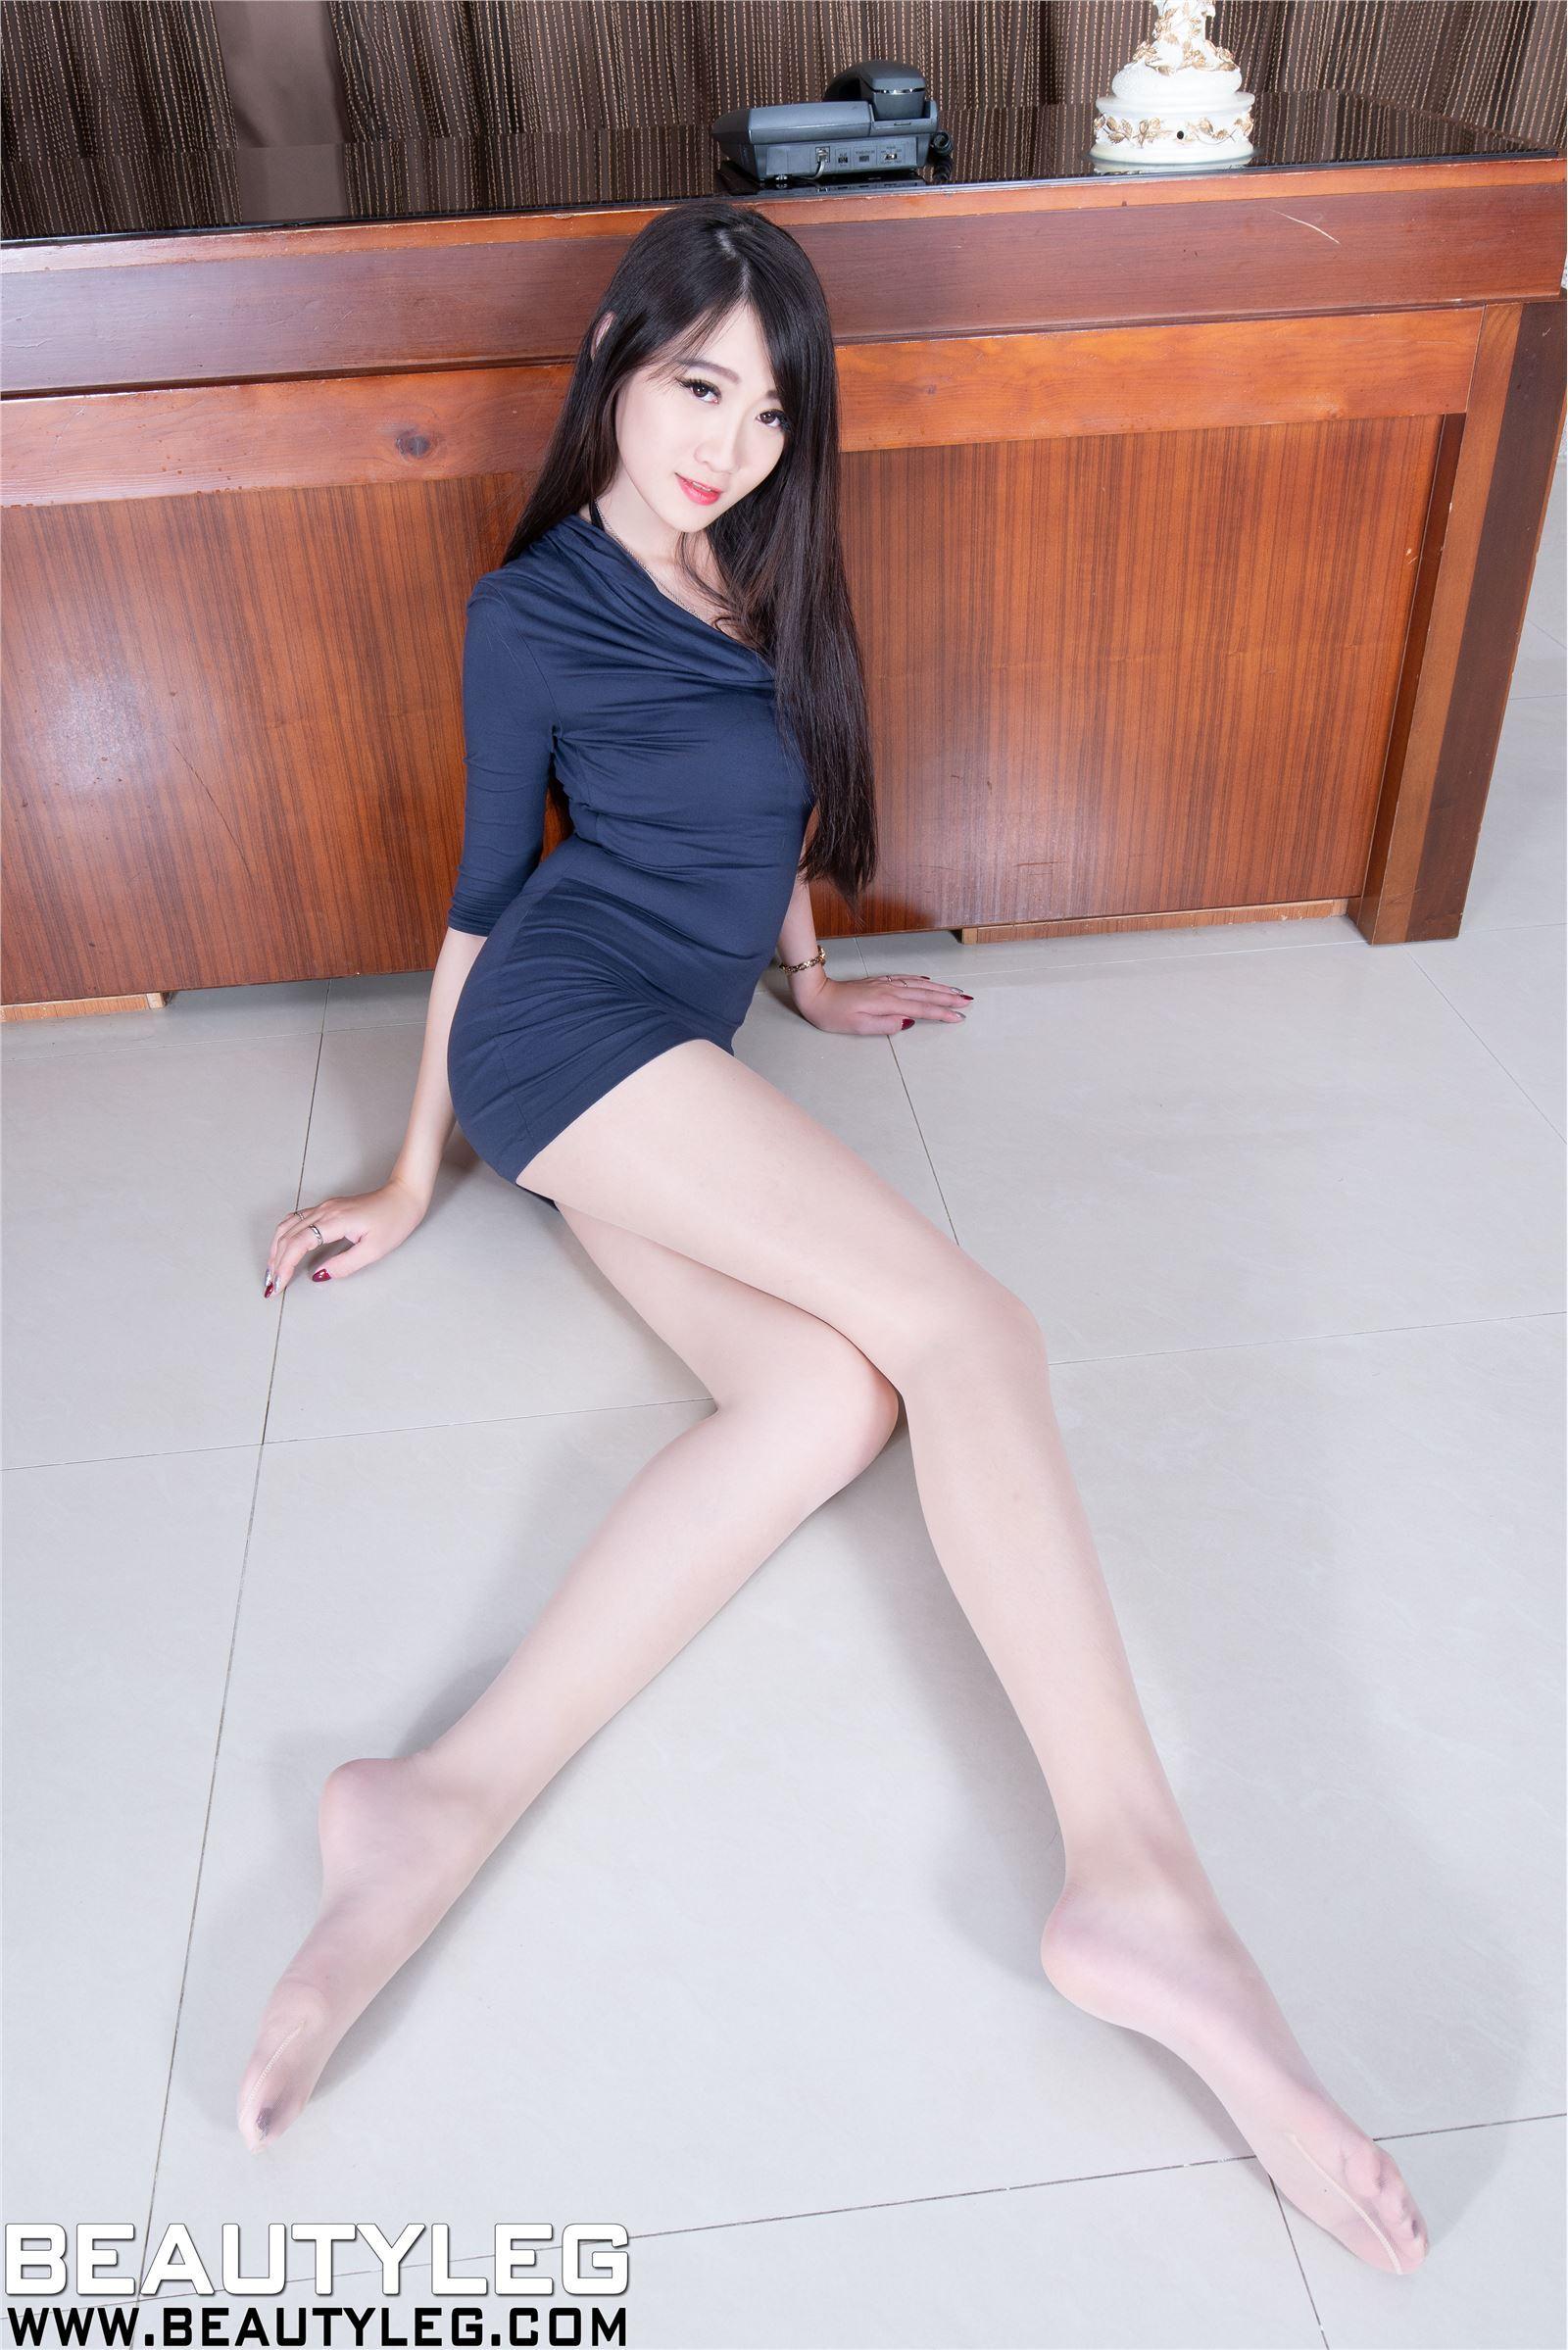 Beautyleg 2018.09.24 No.1662 Cher